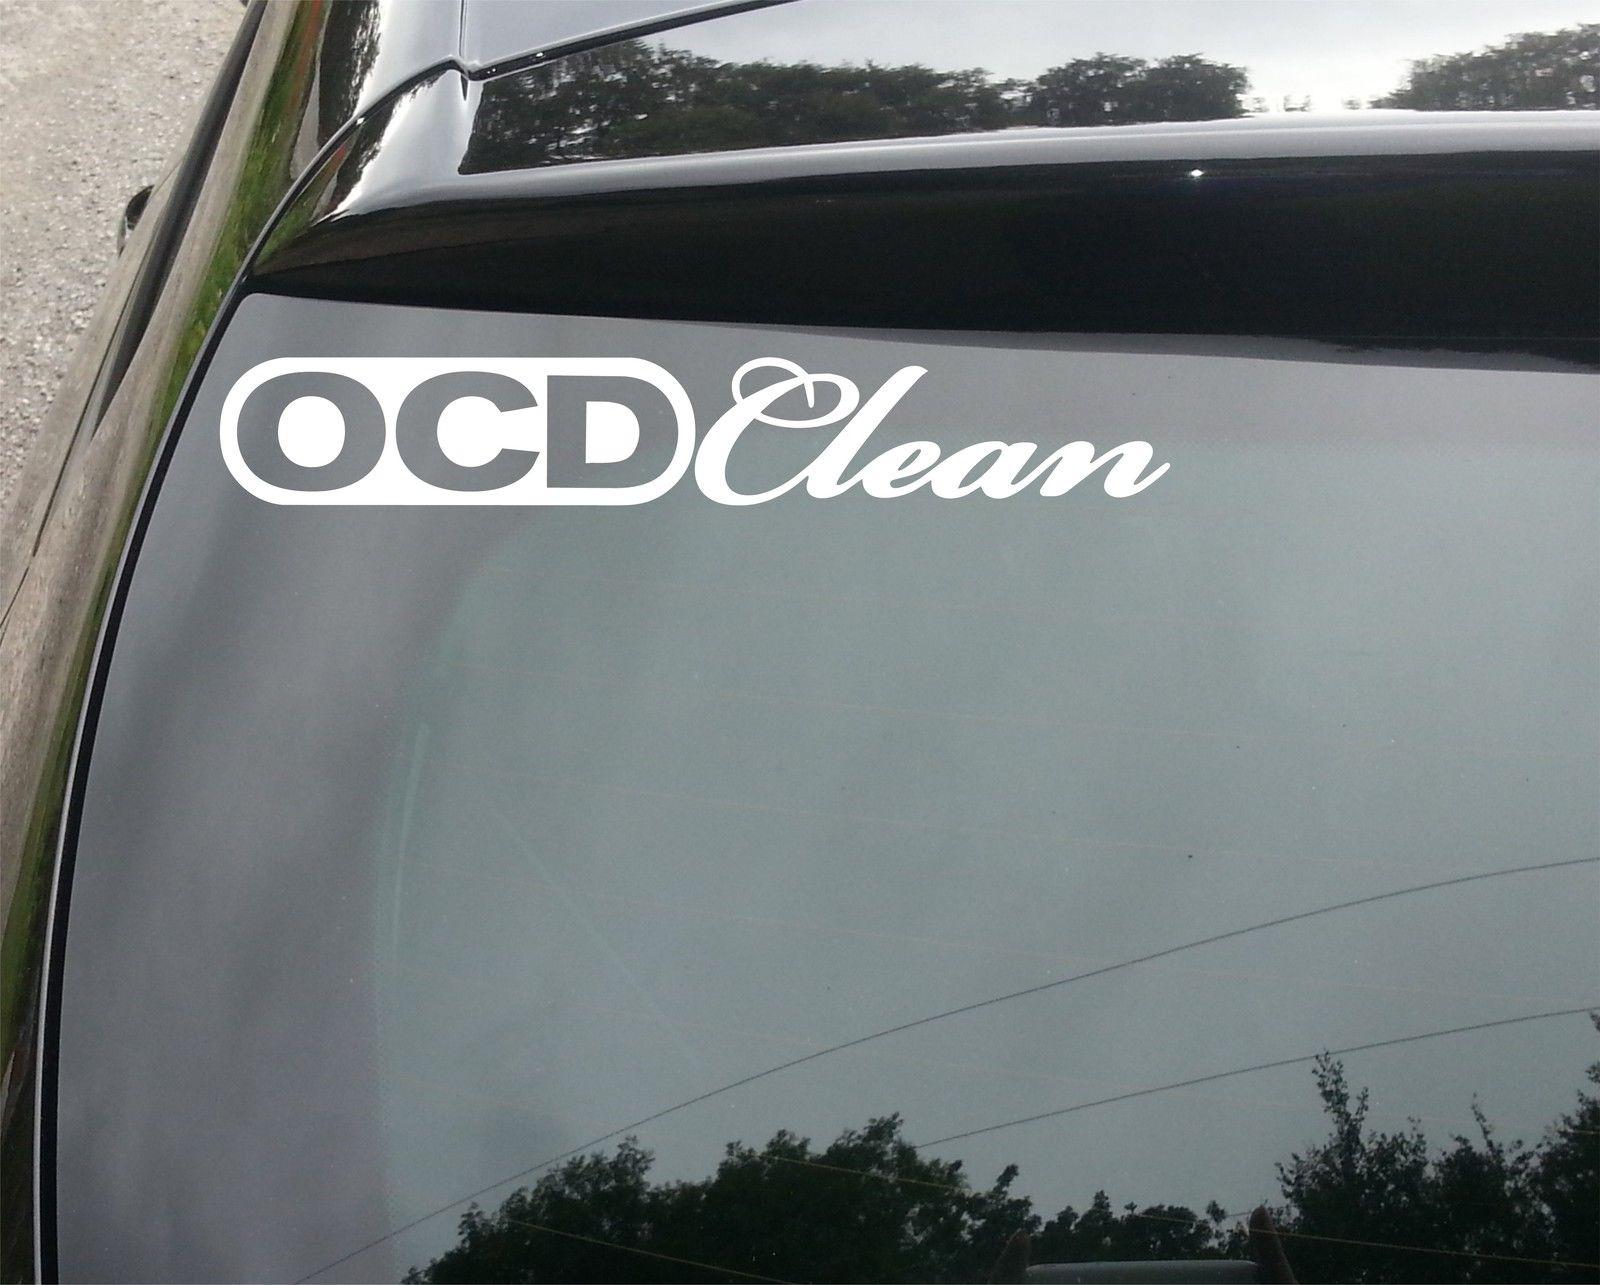 Ocd clean car van window decal sticker